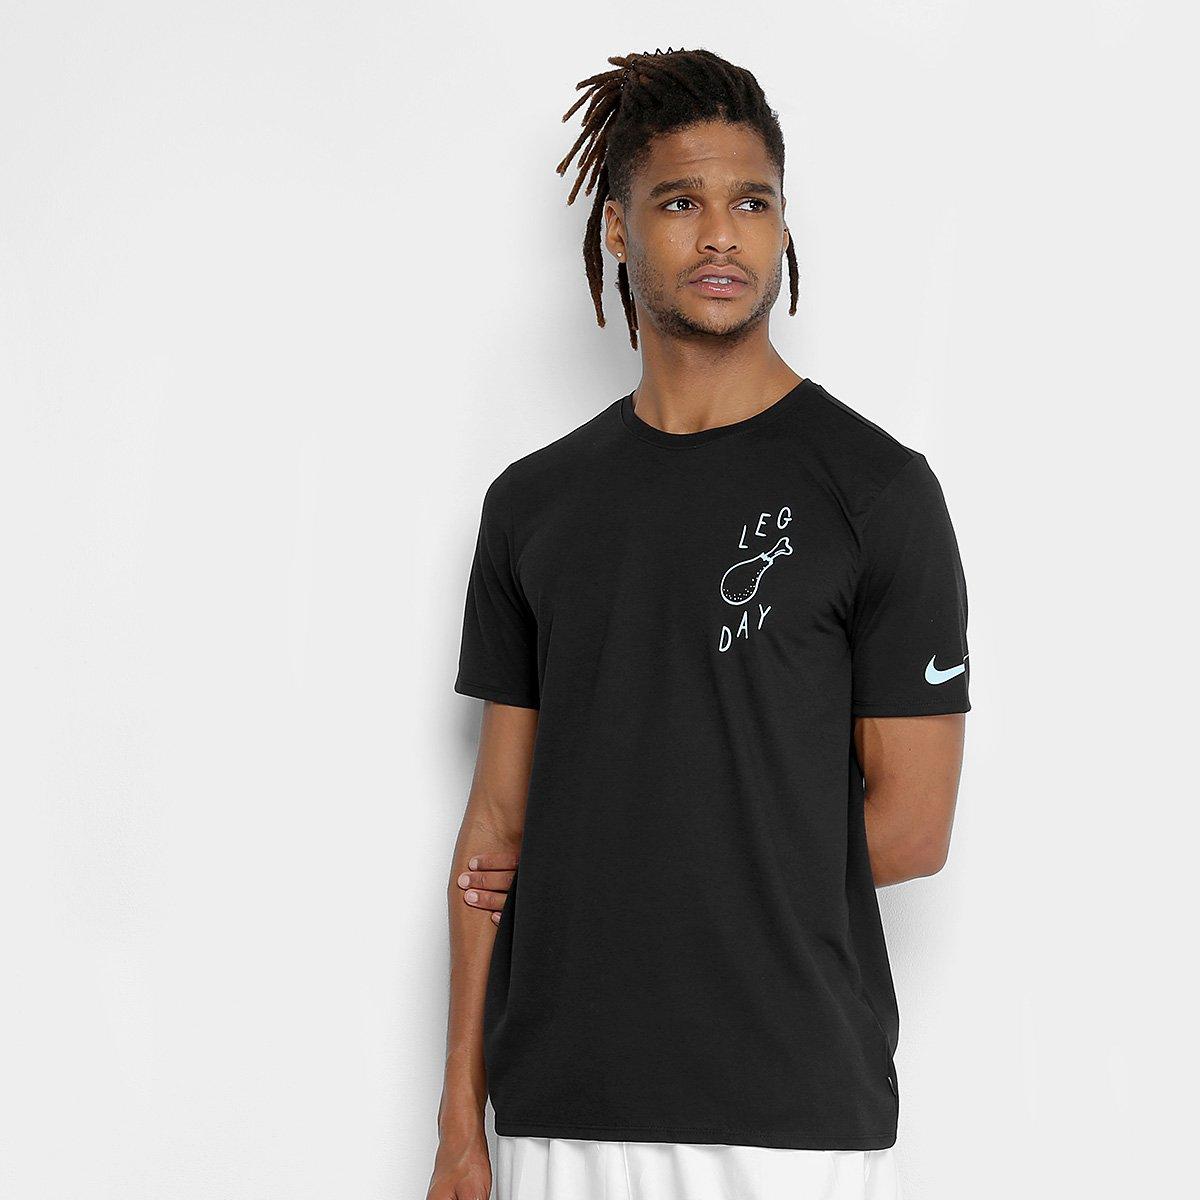 57e8c69b76 Camiseta Nike Dry Leg Day Masculina - Preto | Loja do Inter